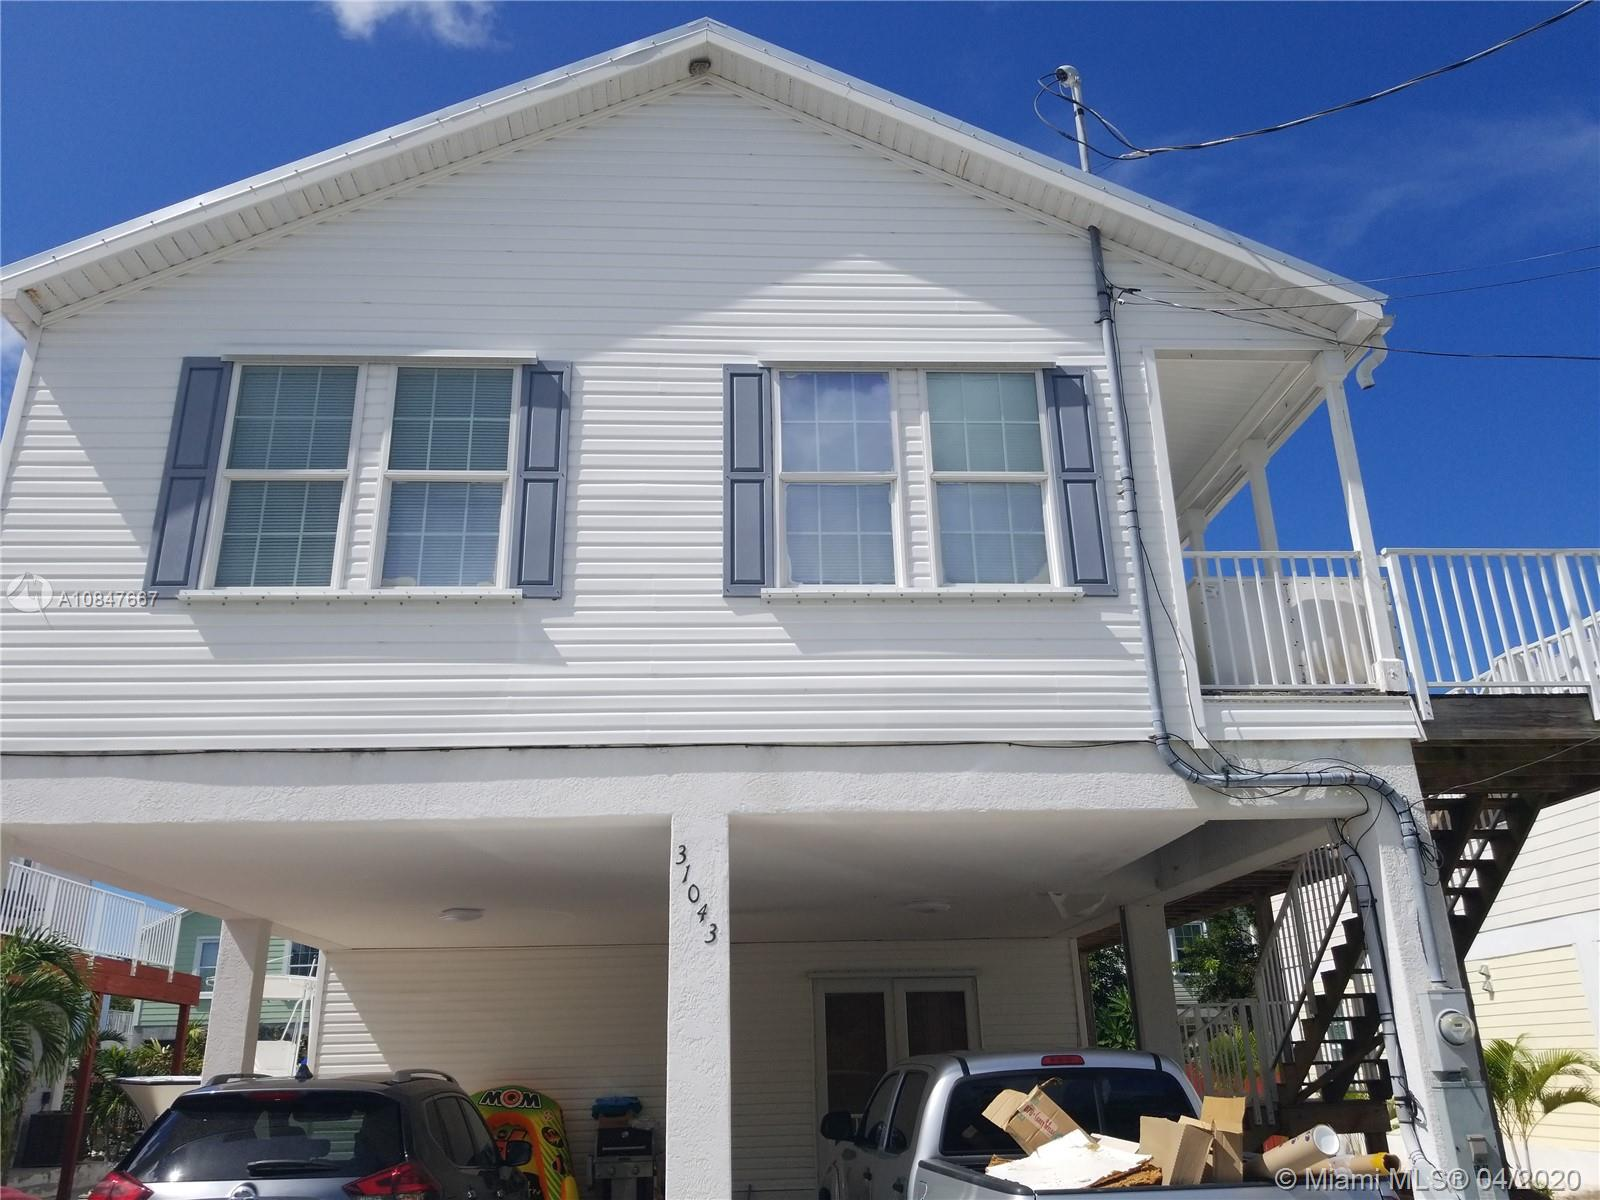 31043 Avenue C Property Photo - Big Pine, FL real estate listing